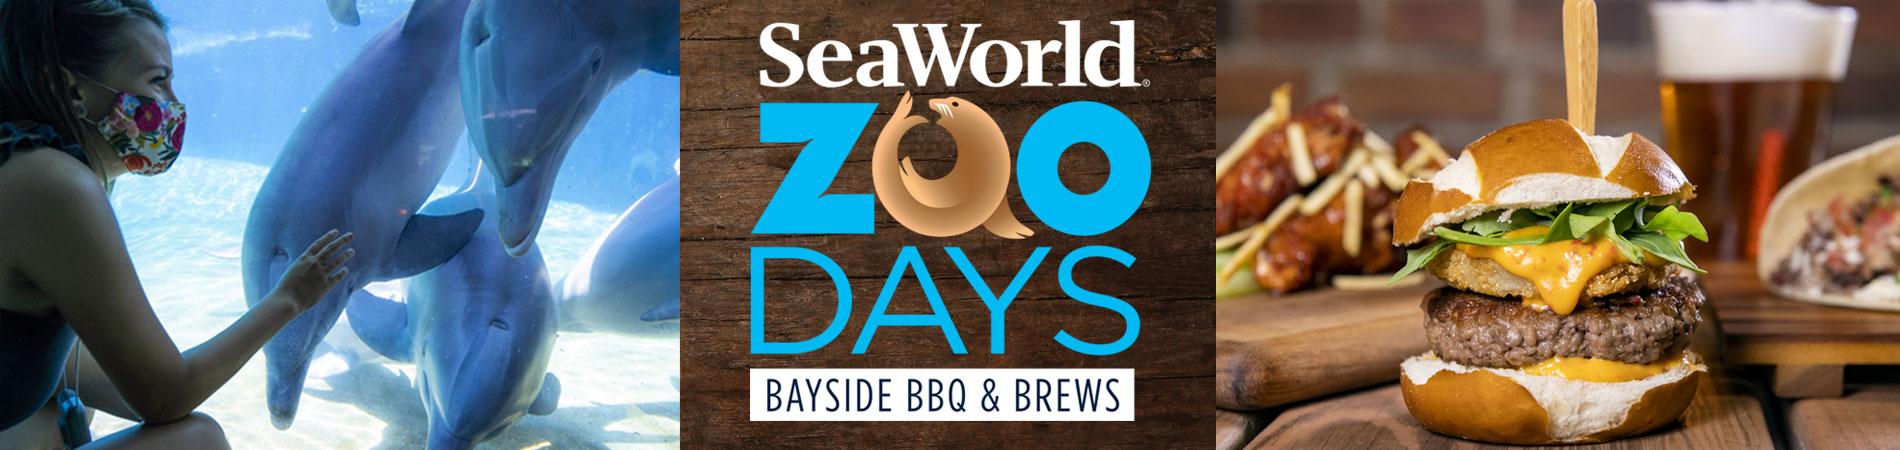 SeaWorld San Diego Zoo Days Bayside BBQ and Brews